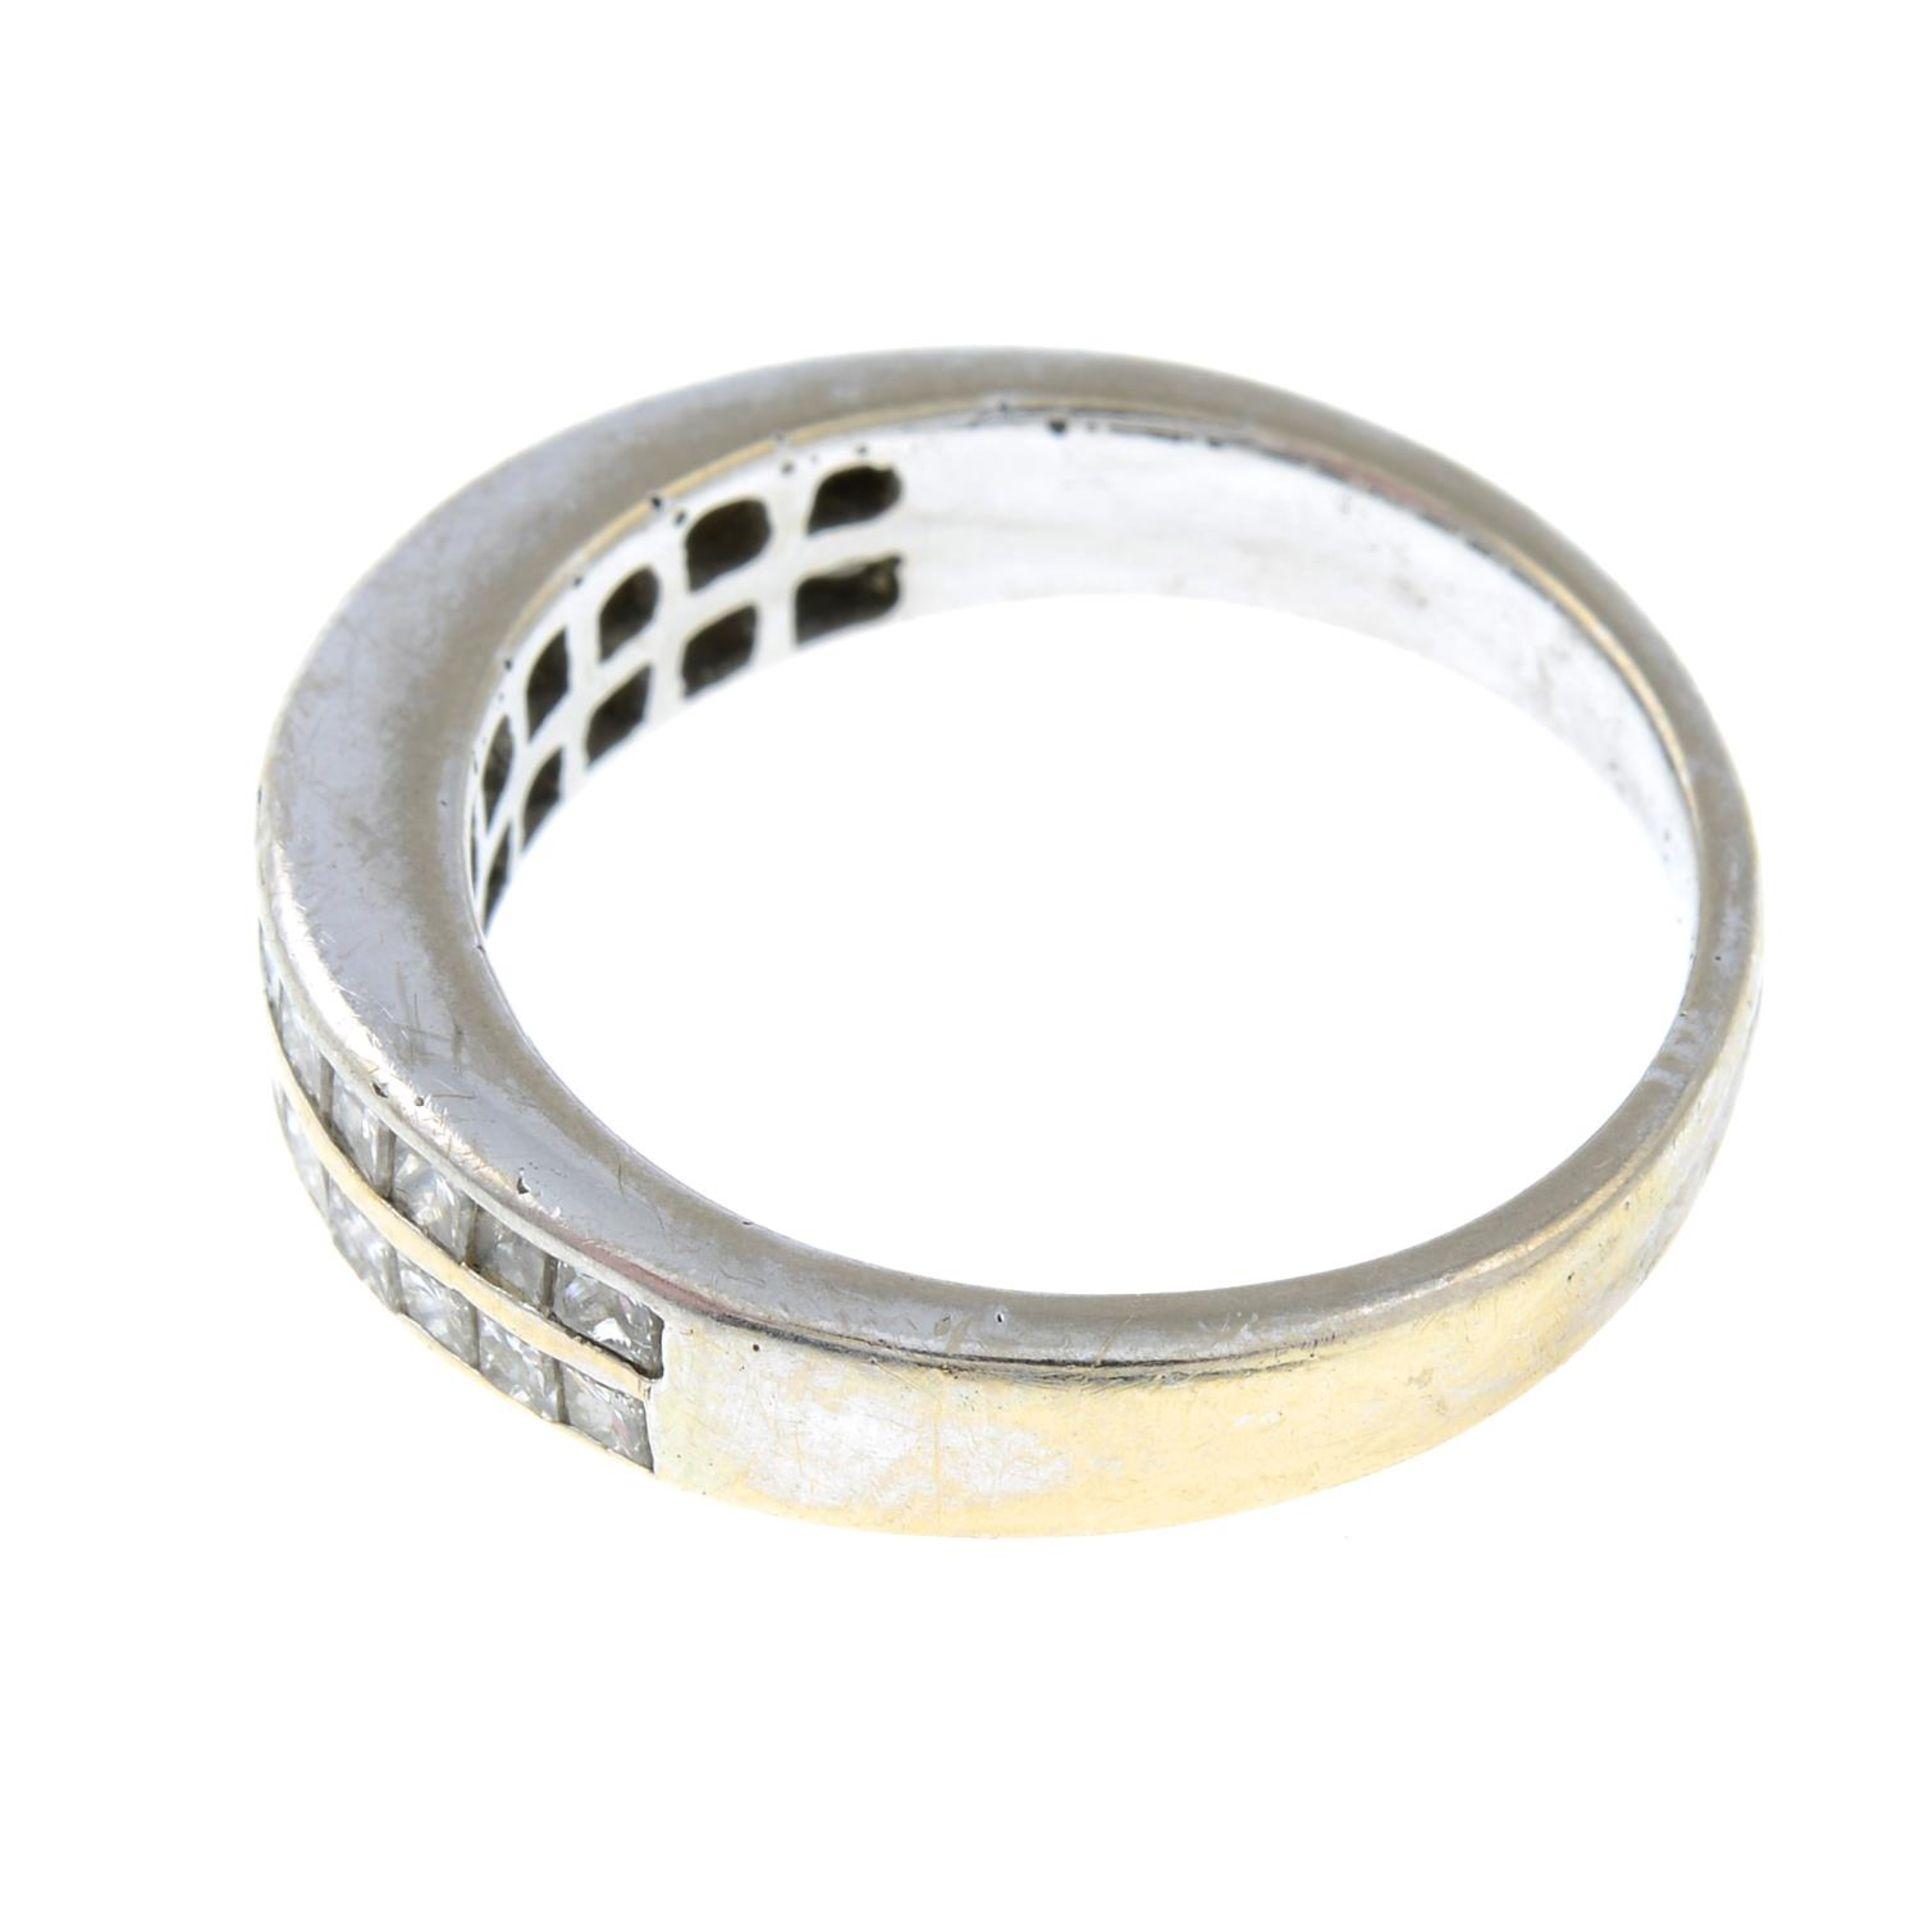 A brilliant-cut diamond two-row half eternity ring.Estimated total diamond weight 0.6c0t. - Bild 2 aus 3